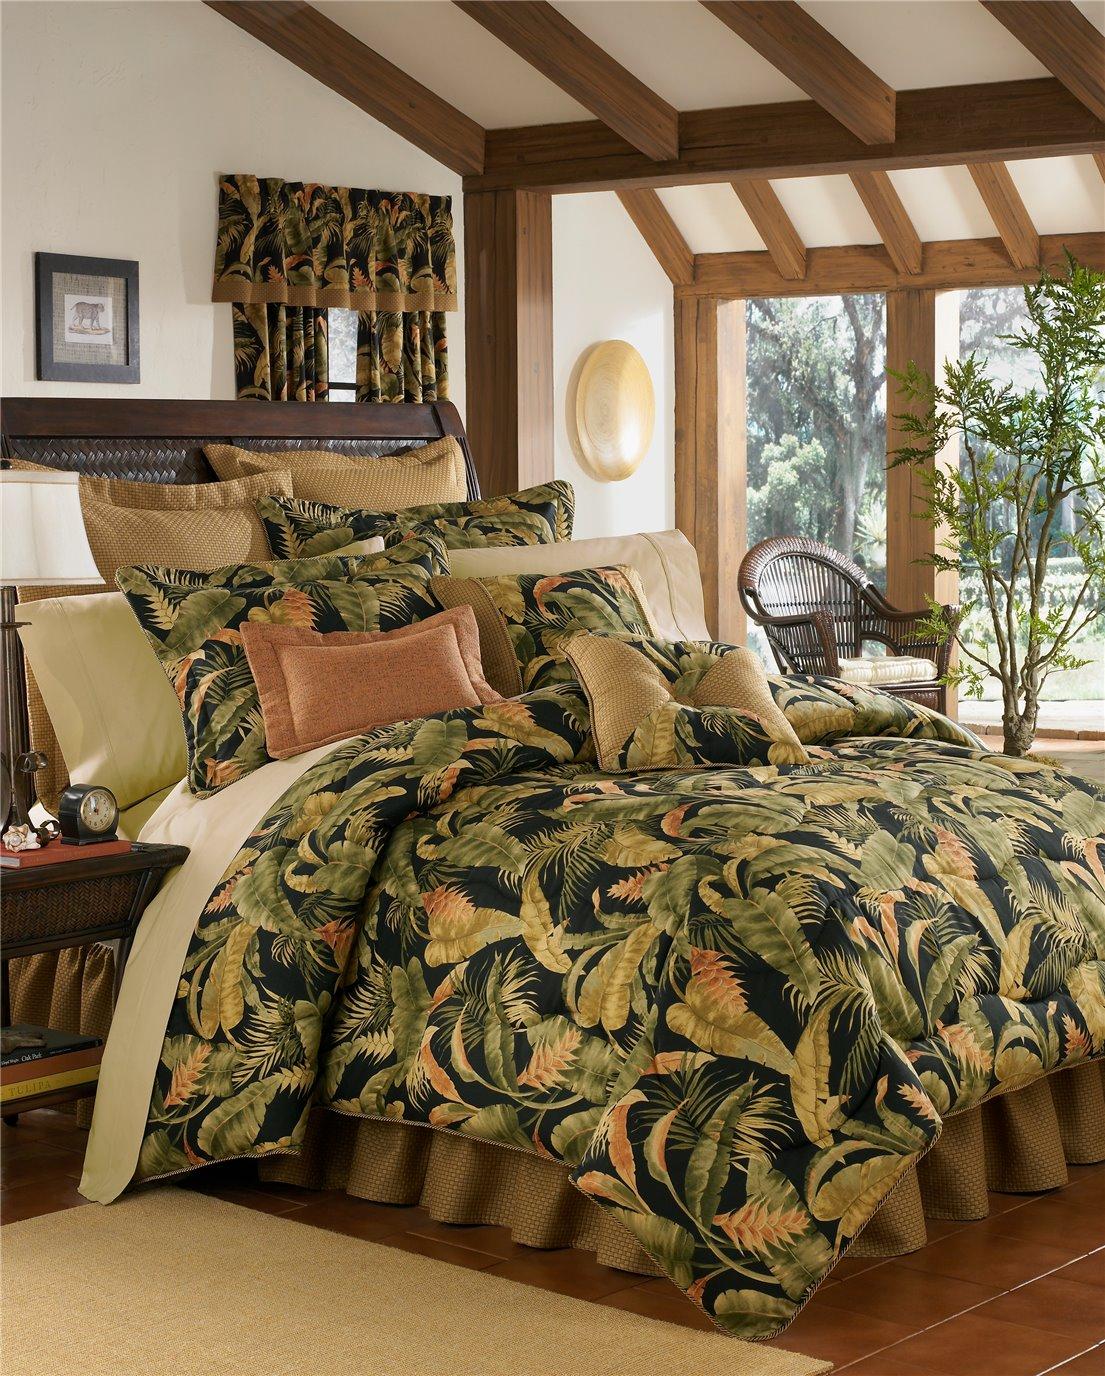 "La Selva Black Cal King Thomasville Comforter Set (15"" bedskirt)"